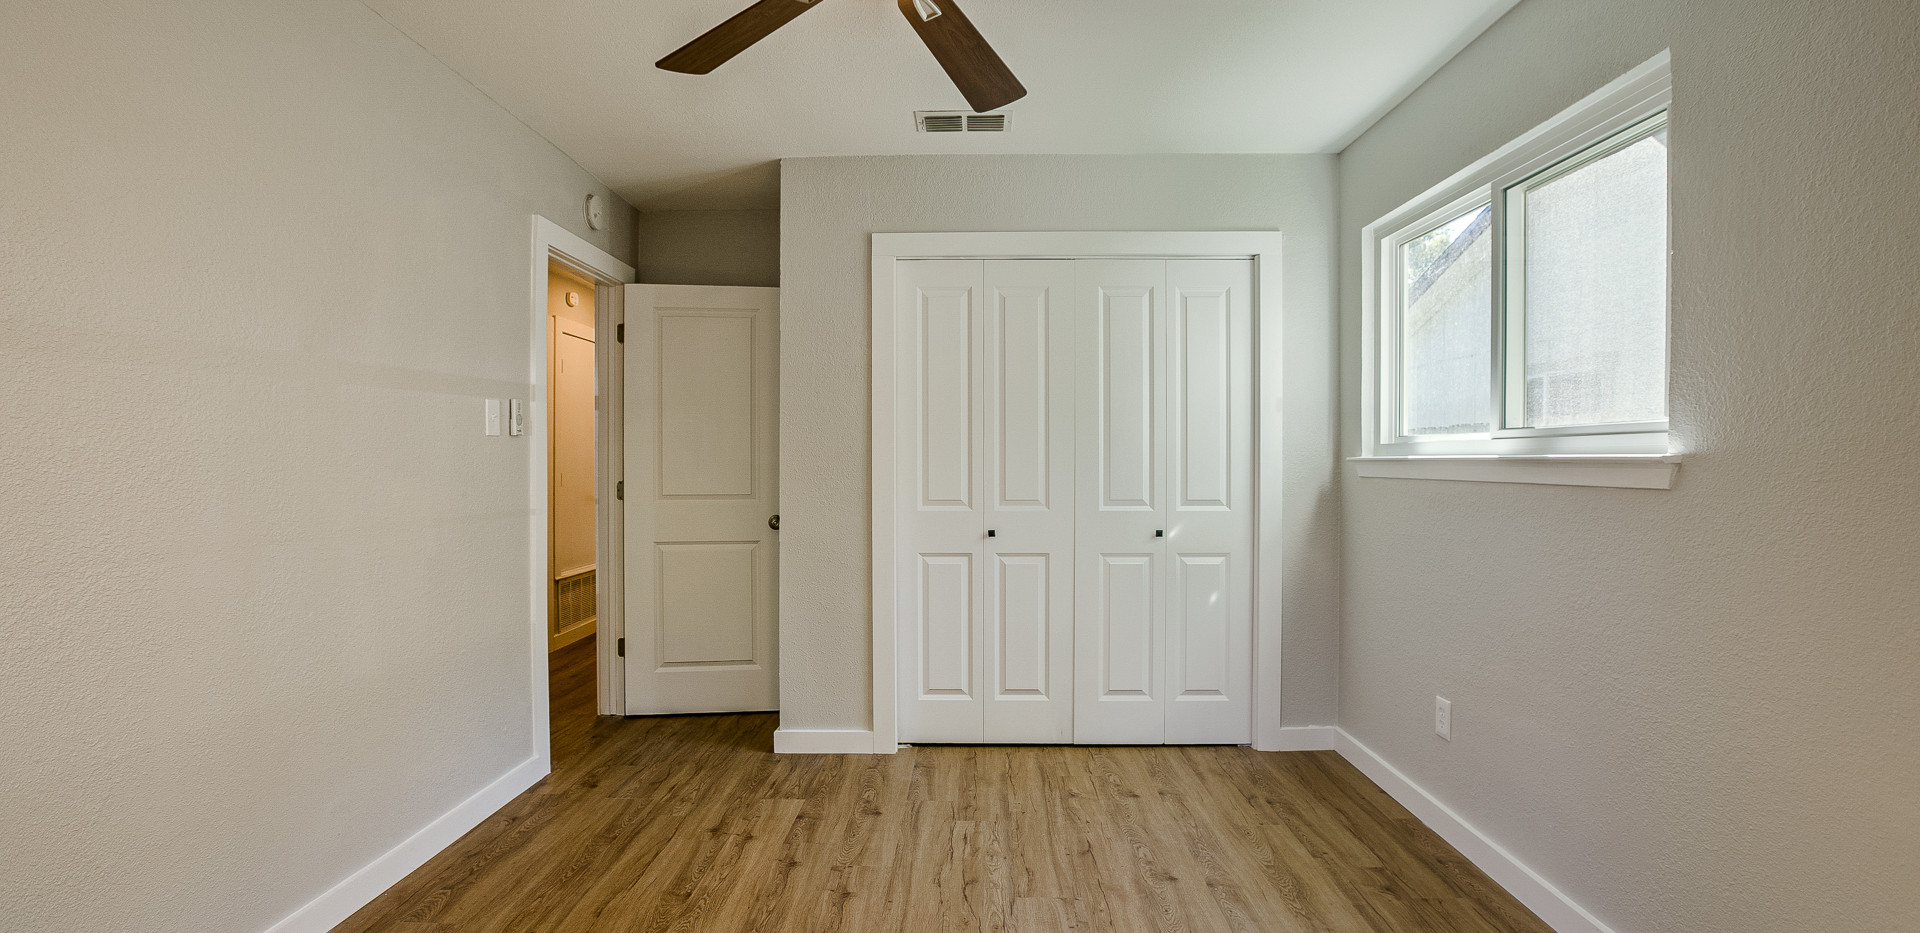 Burly Oak Bedroom